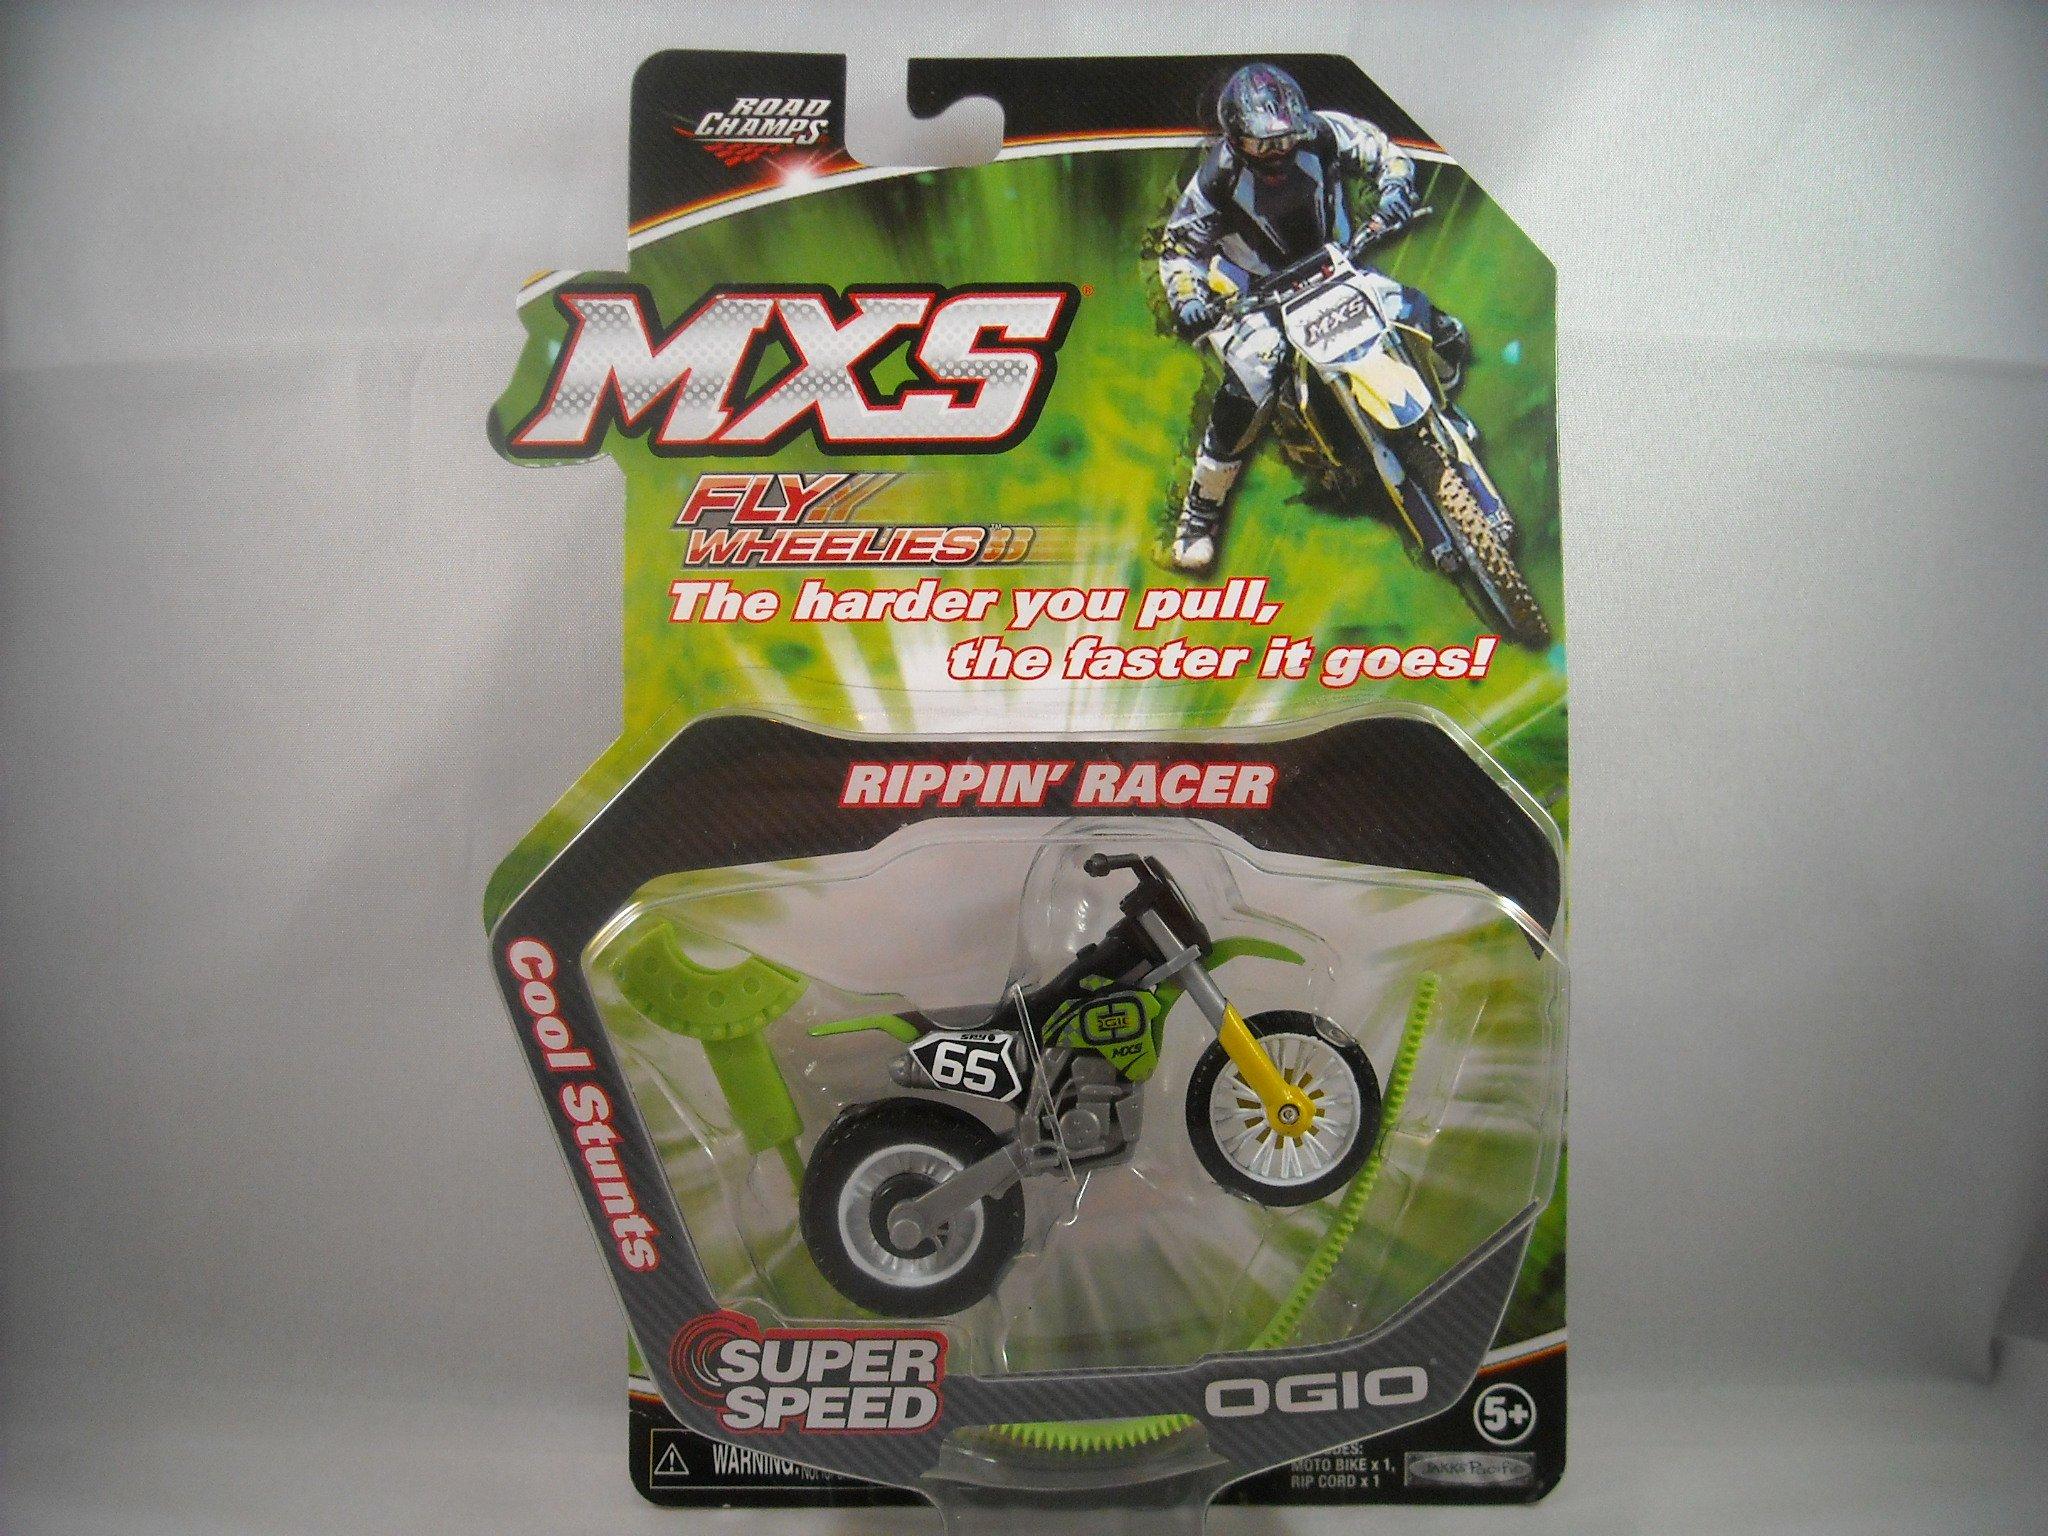 MXS Fly Wheelies Rippin Racer 2010 Ogio No Rider